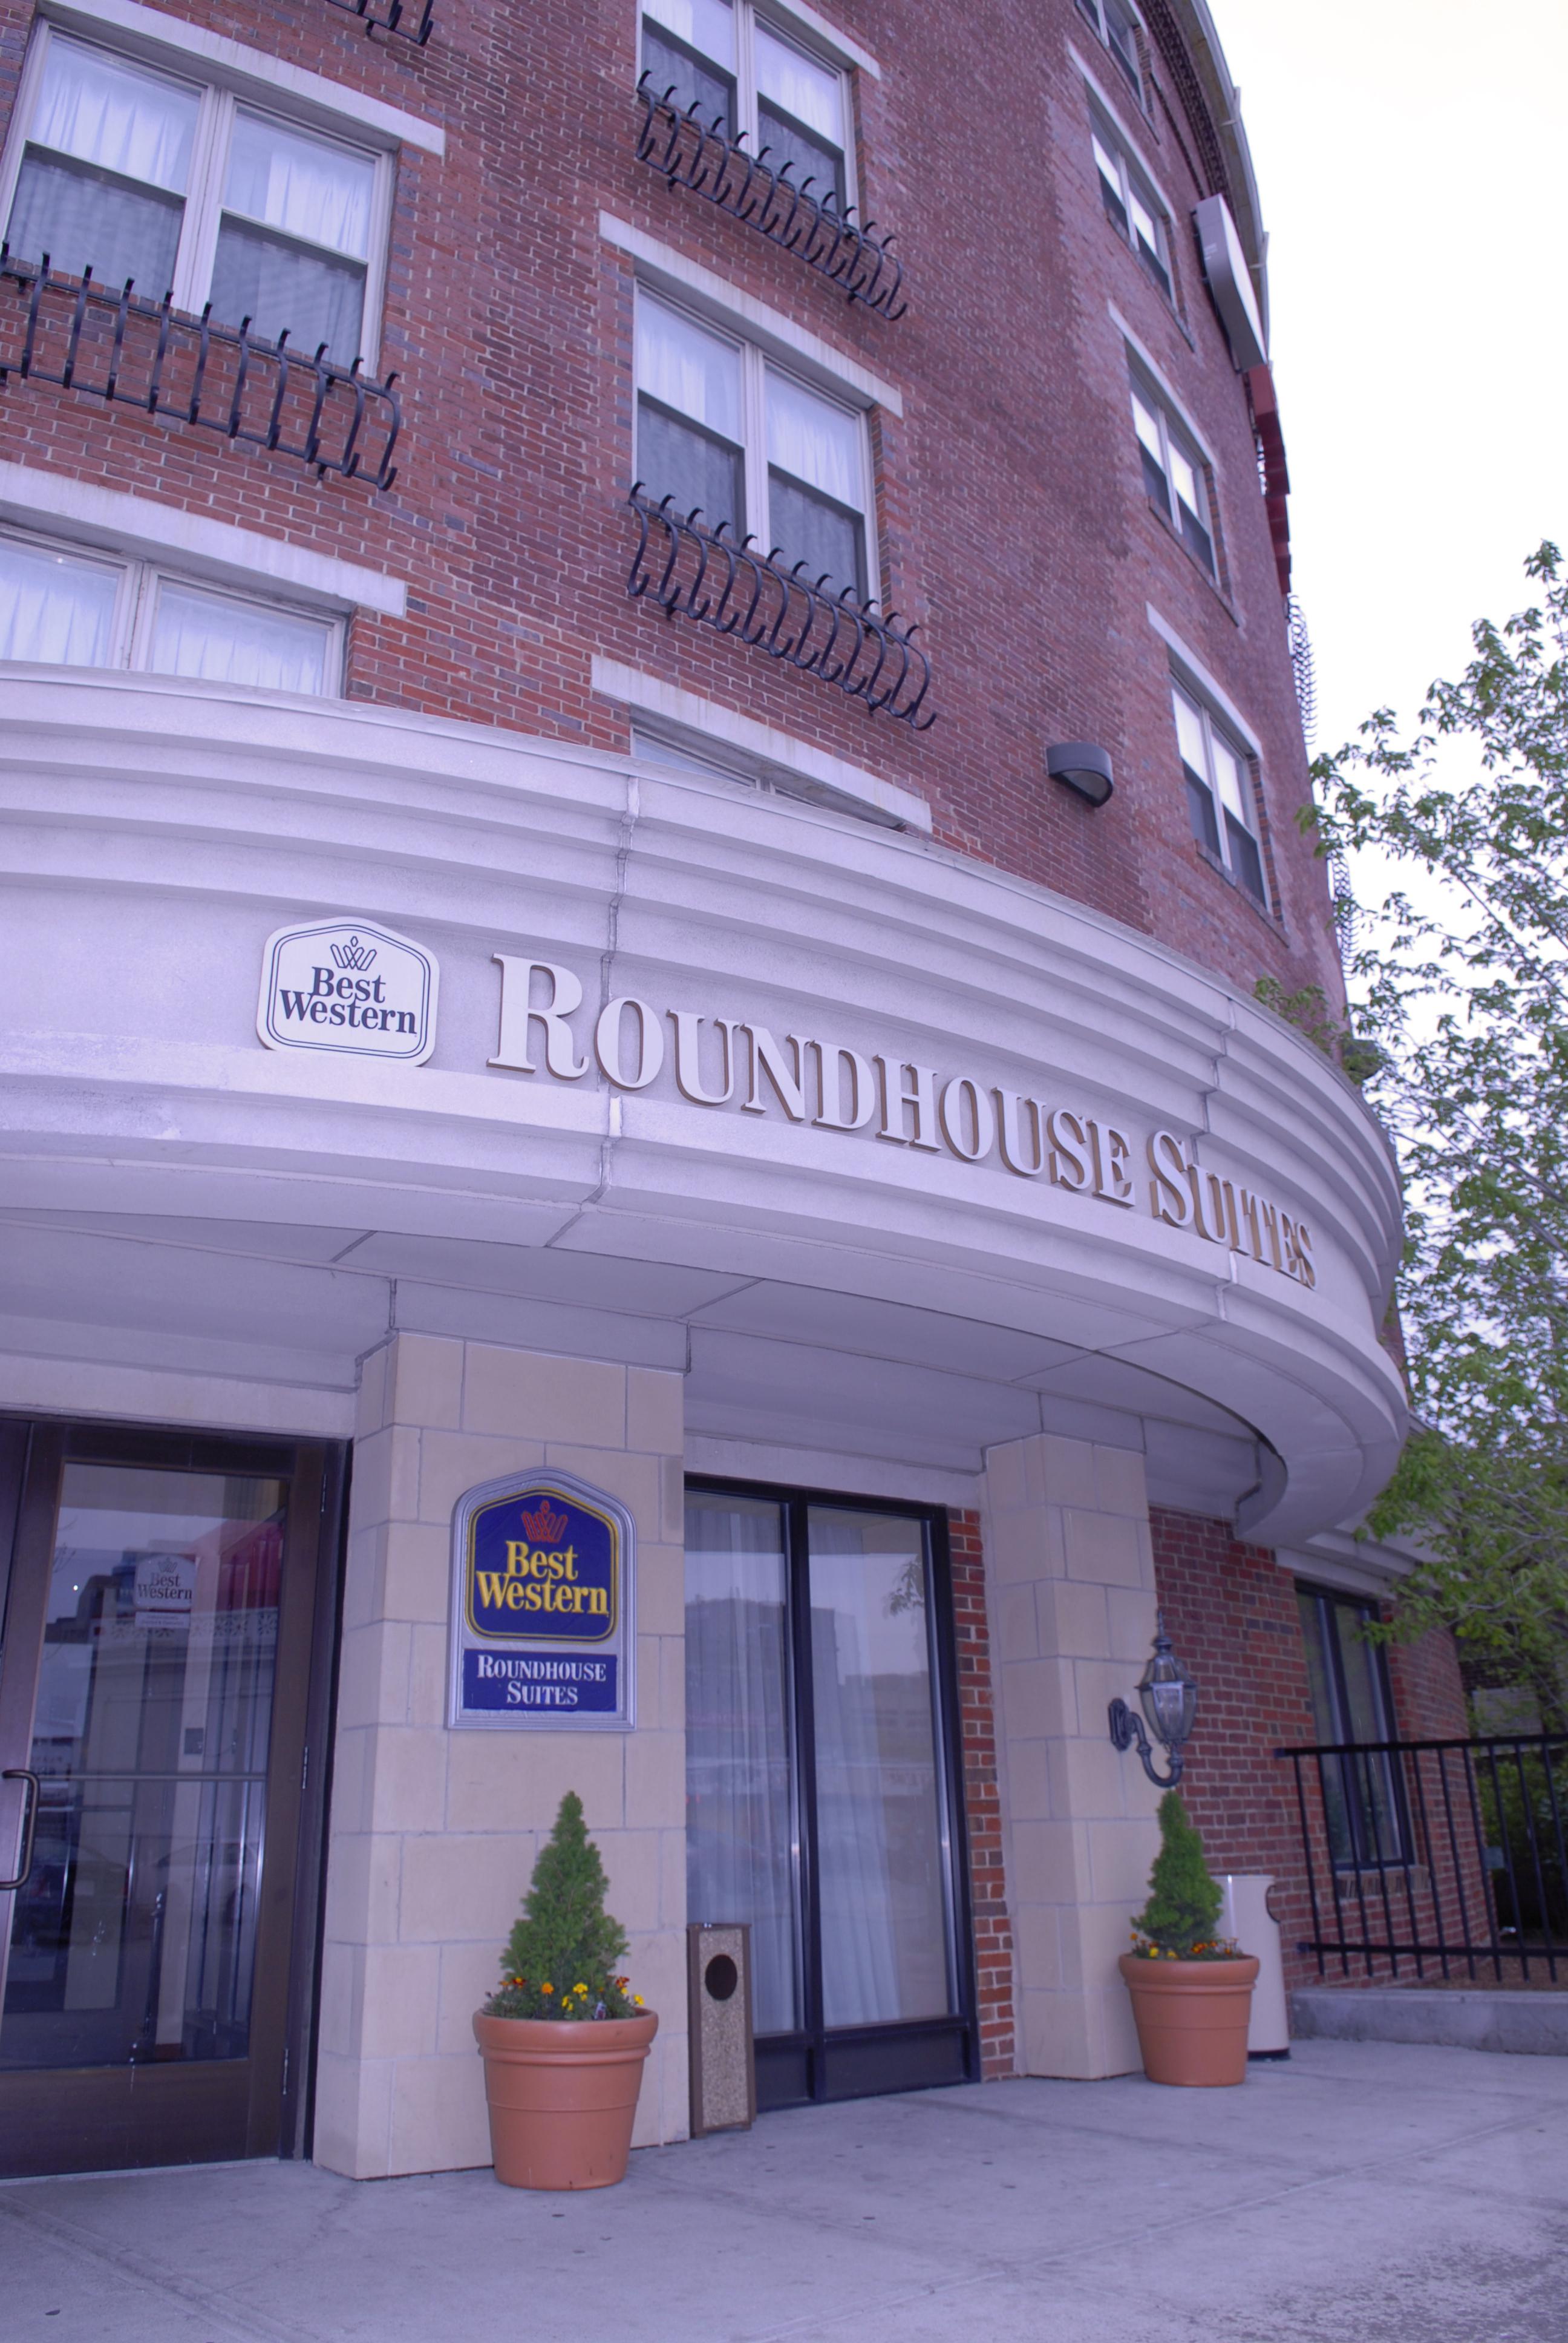 BEST WESTERN PLUS Roundhouse Suites